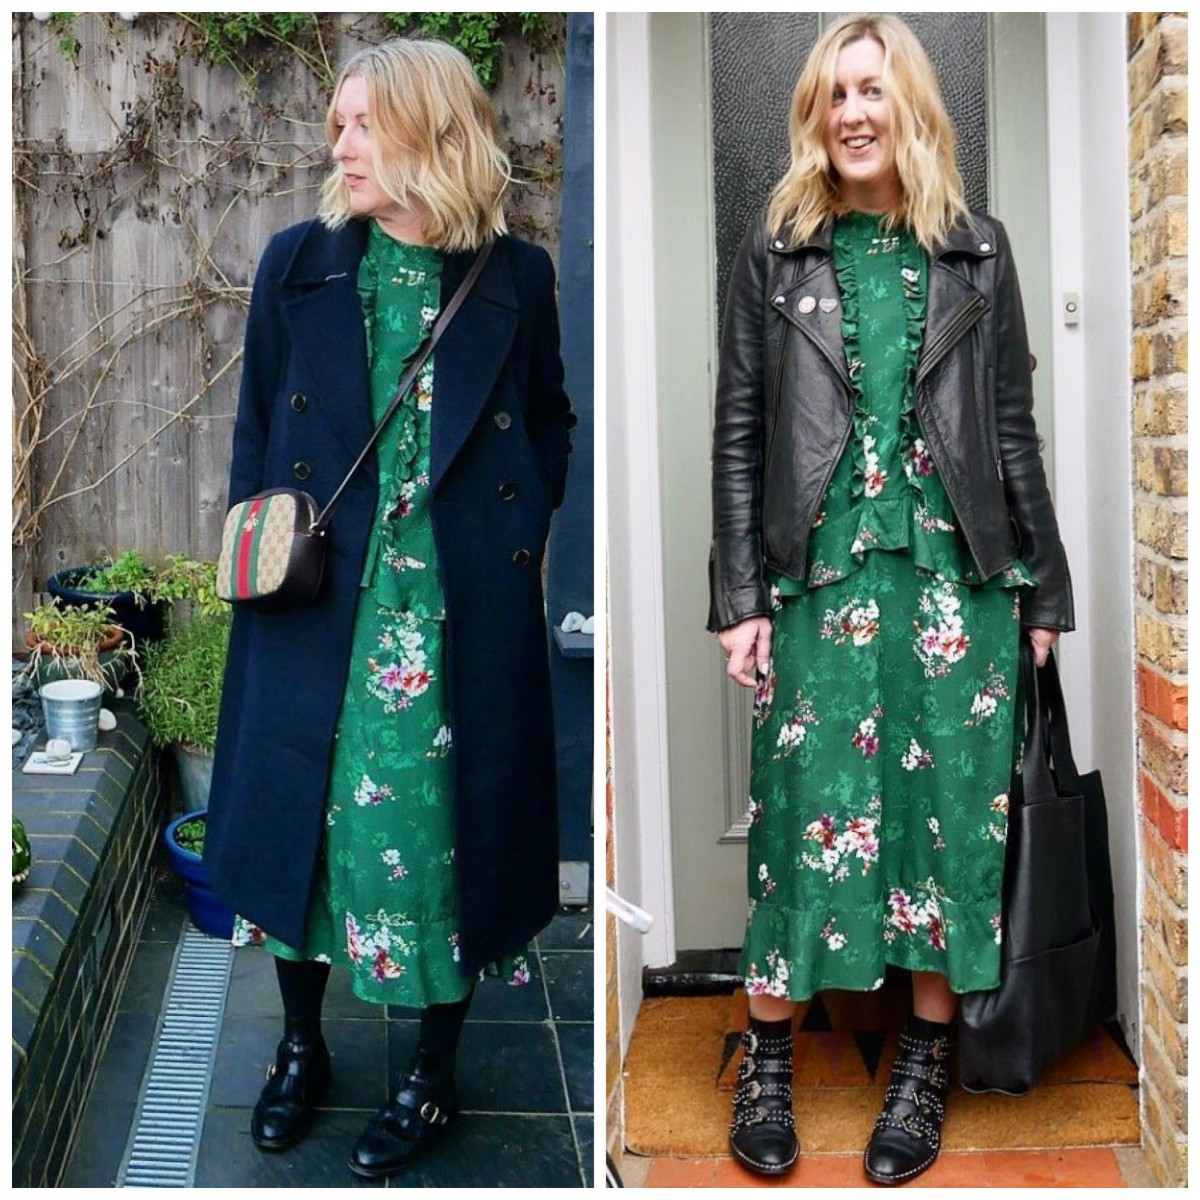 H&M green floral dress